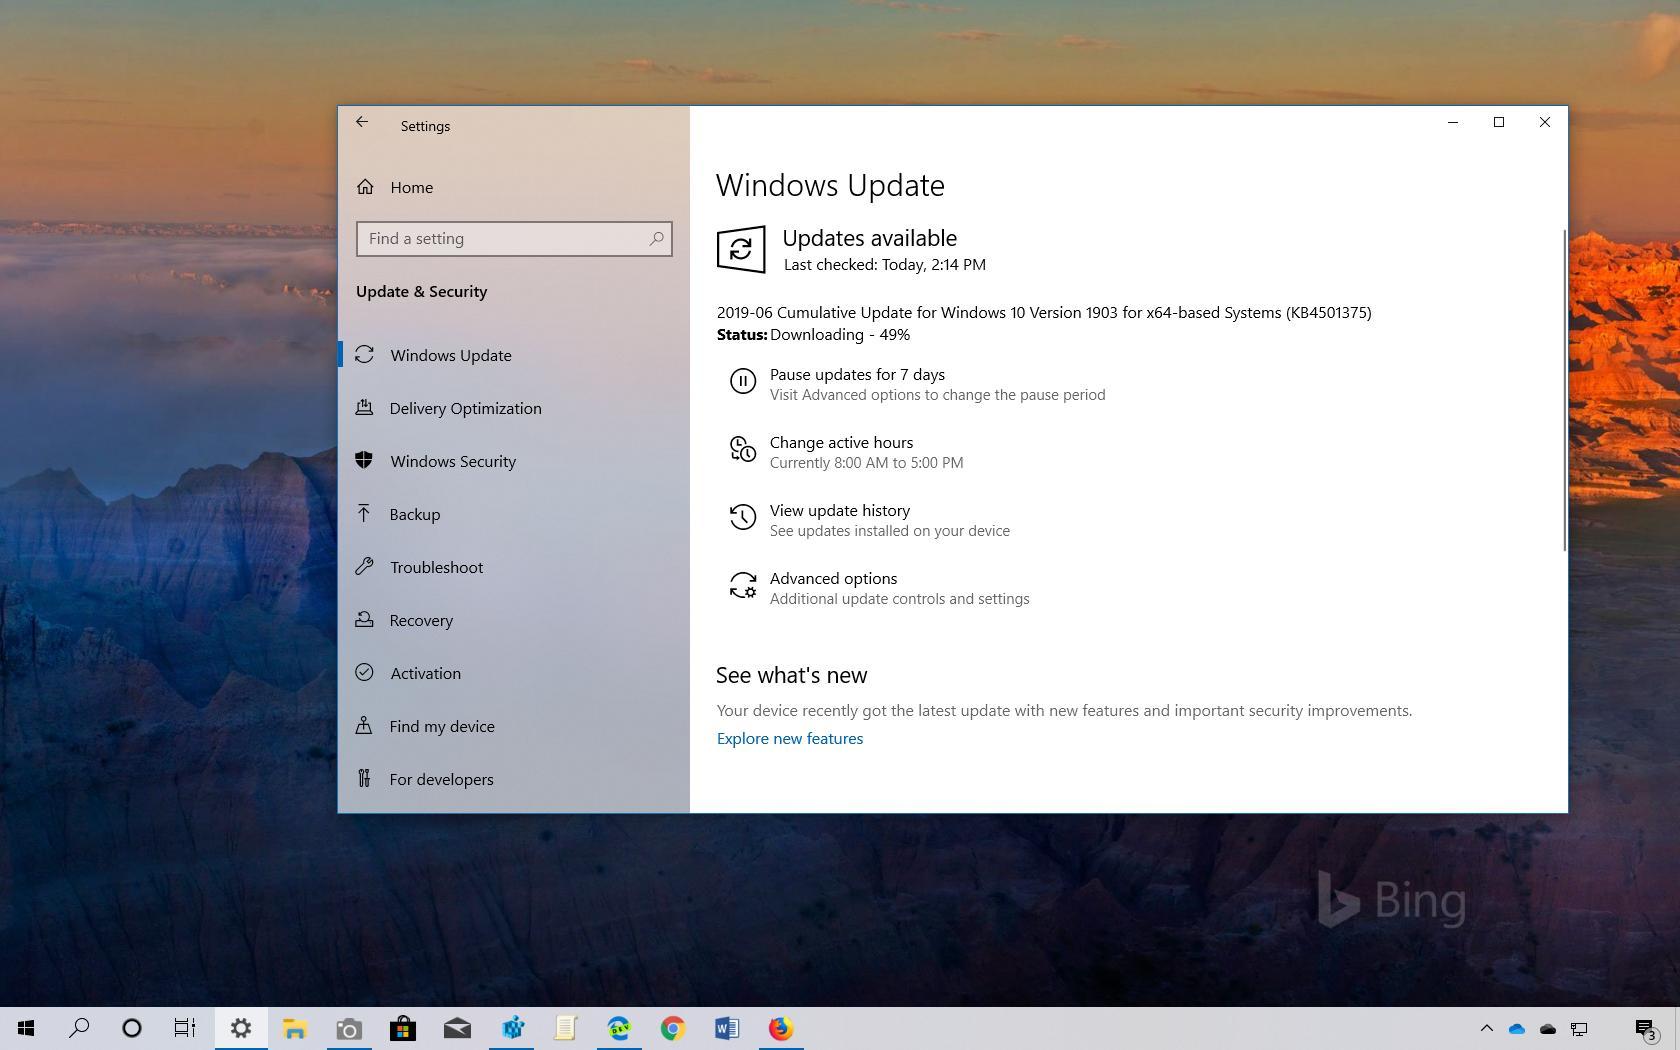 Windows 10 Update KB4501375 download